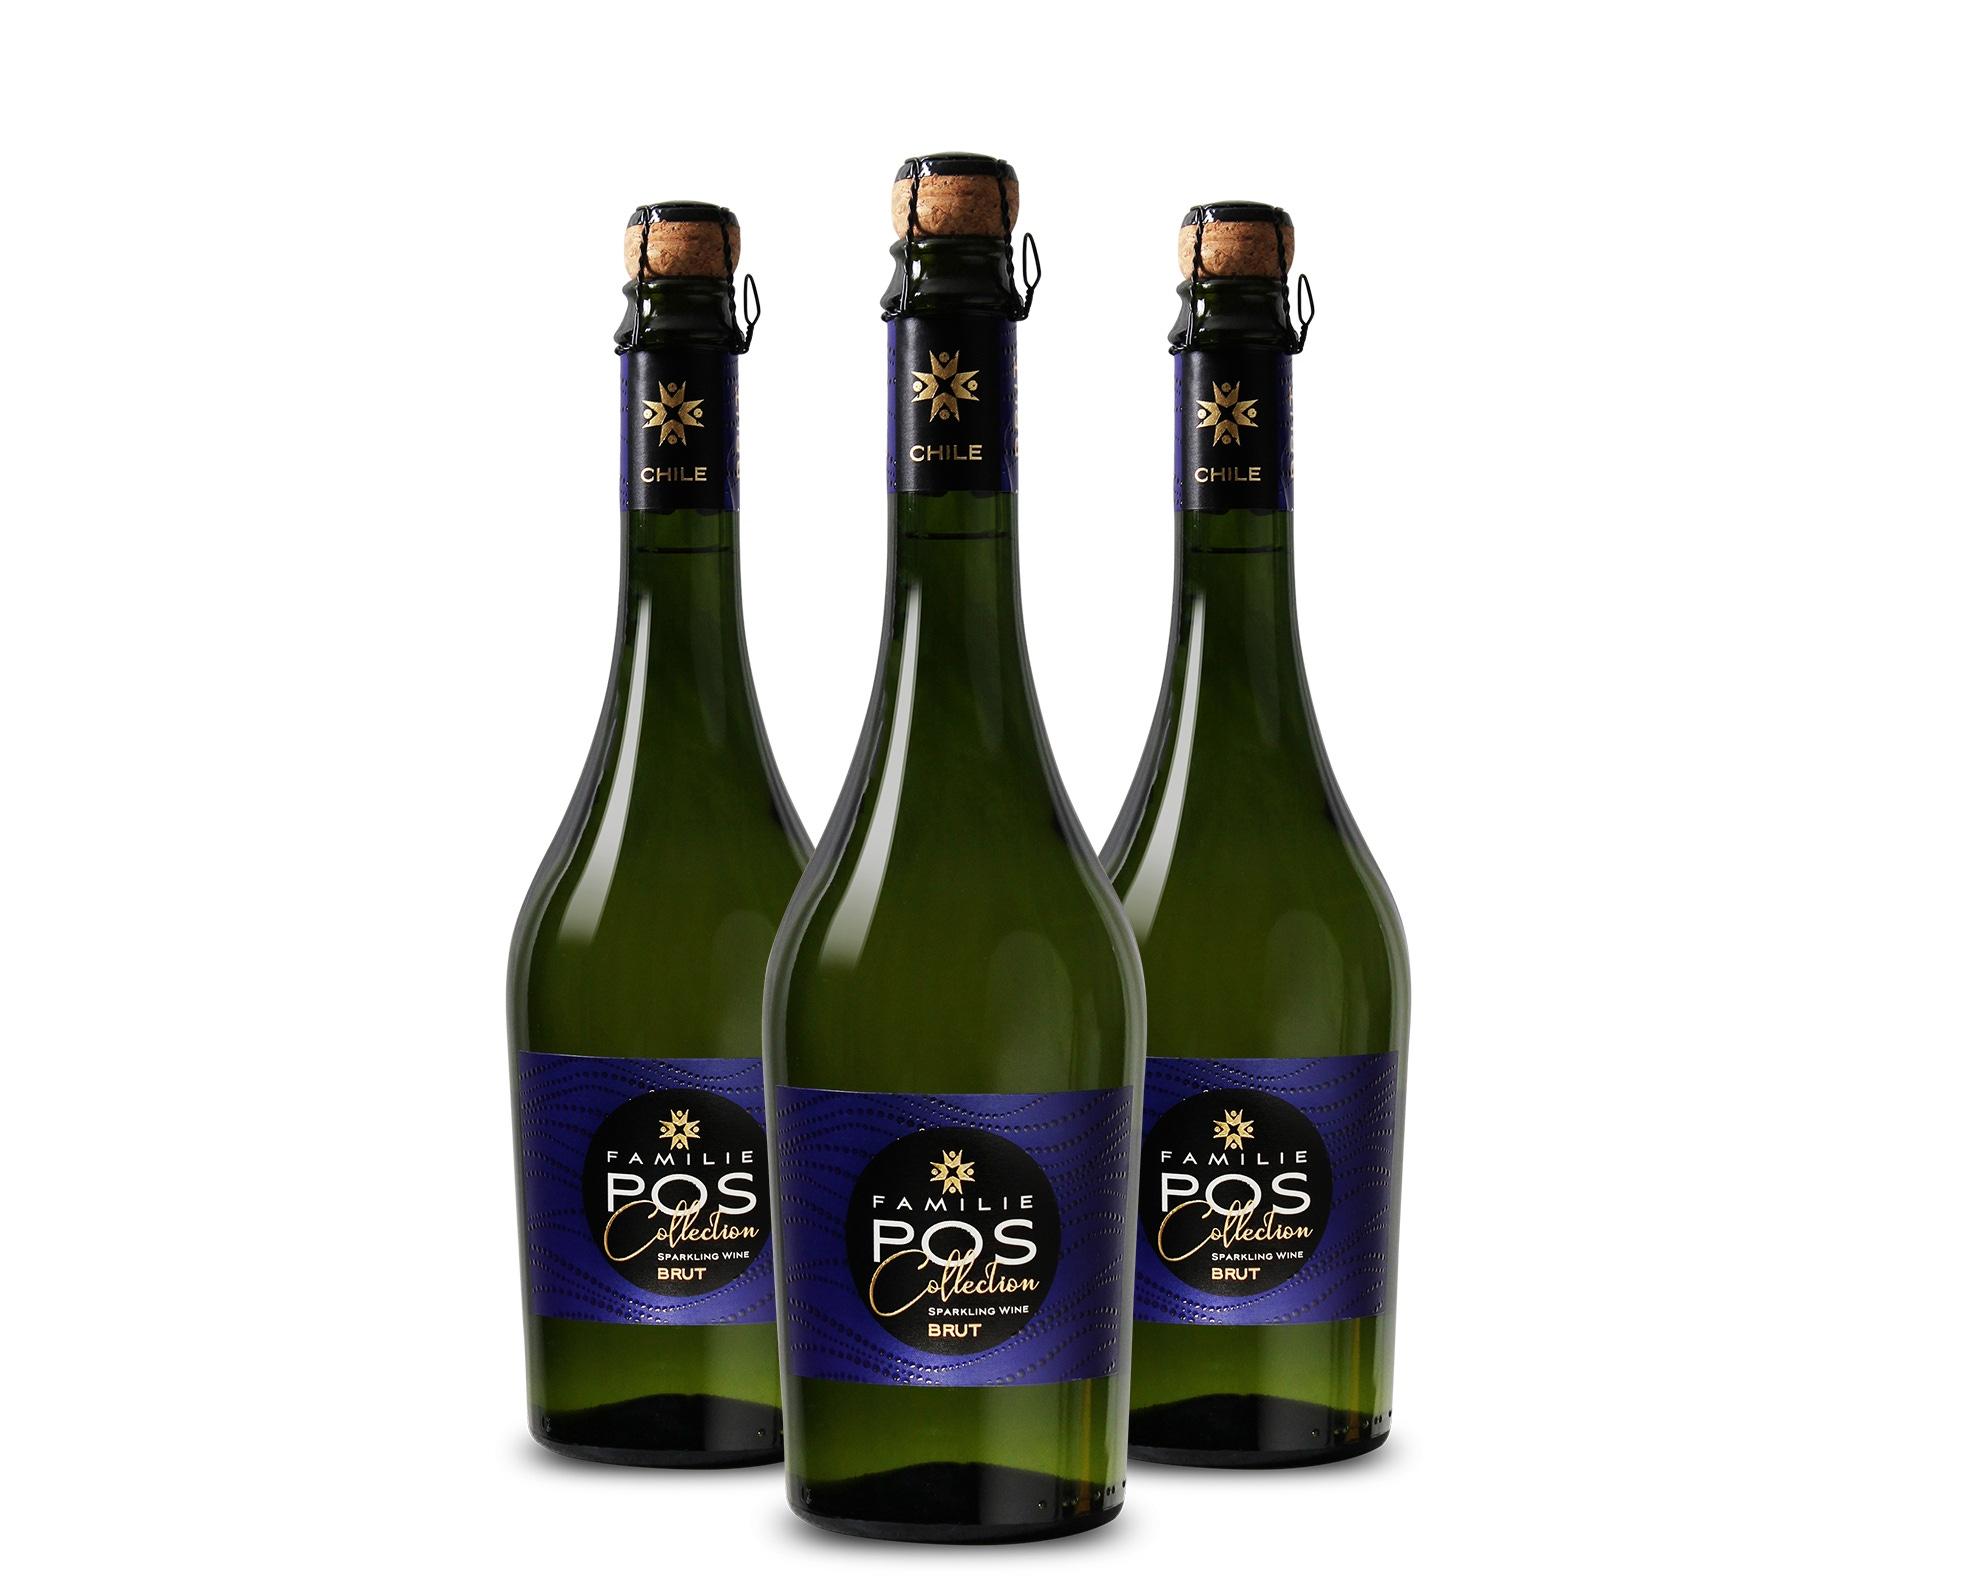 Familie Pos Sparklin Wine Brut